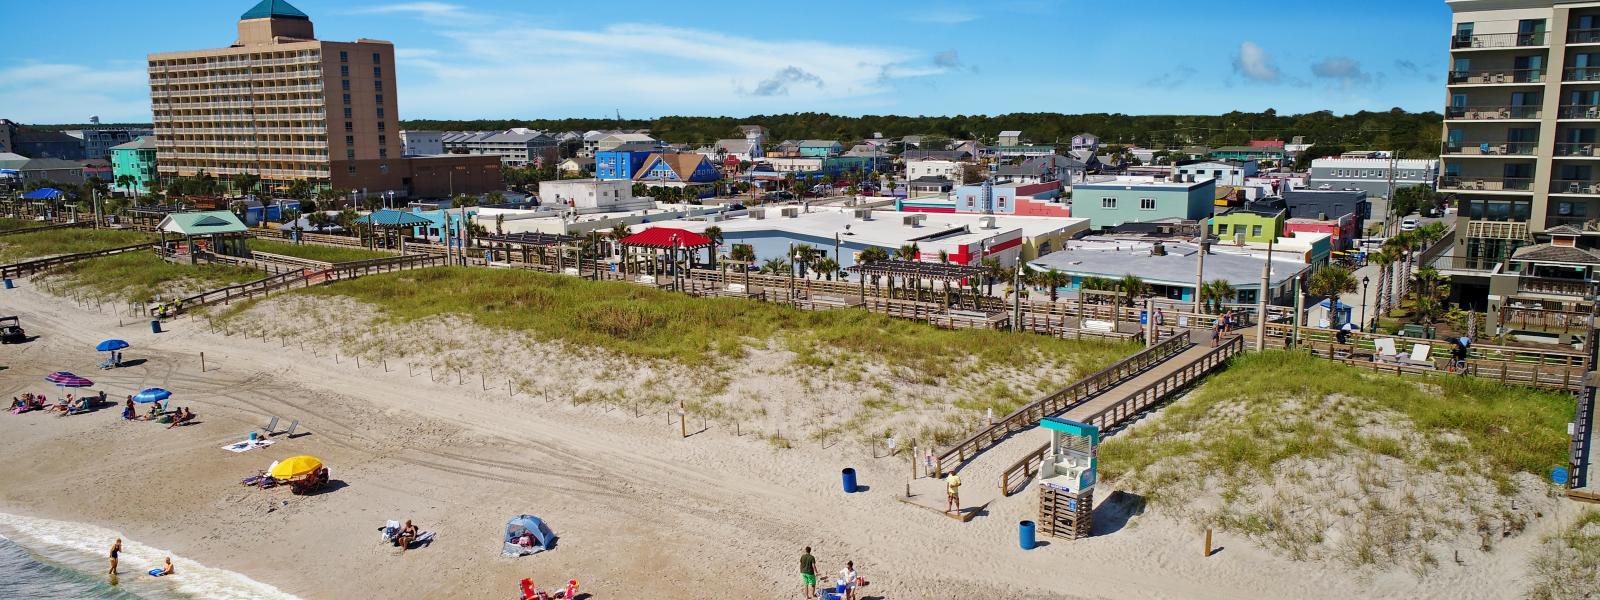 Carolina Beach Boardwalk Things To Do